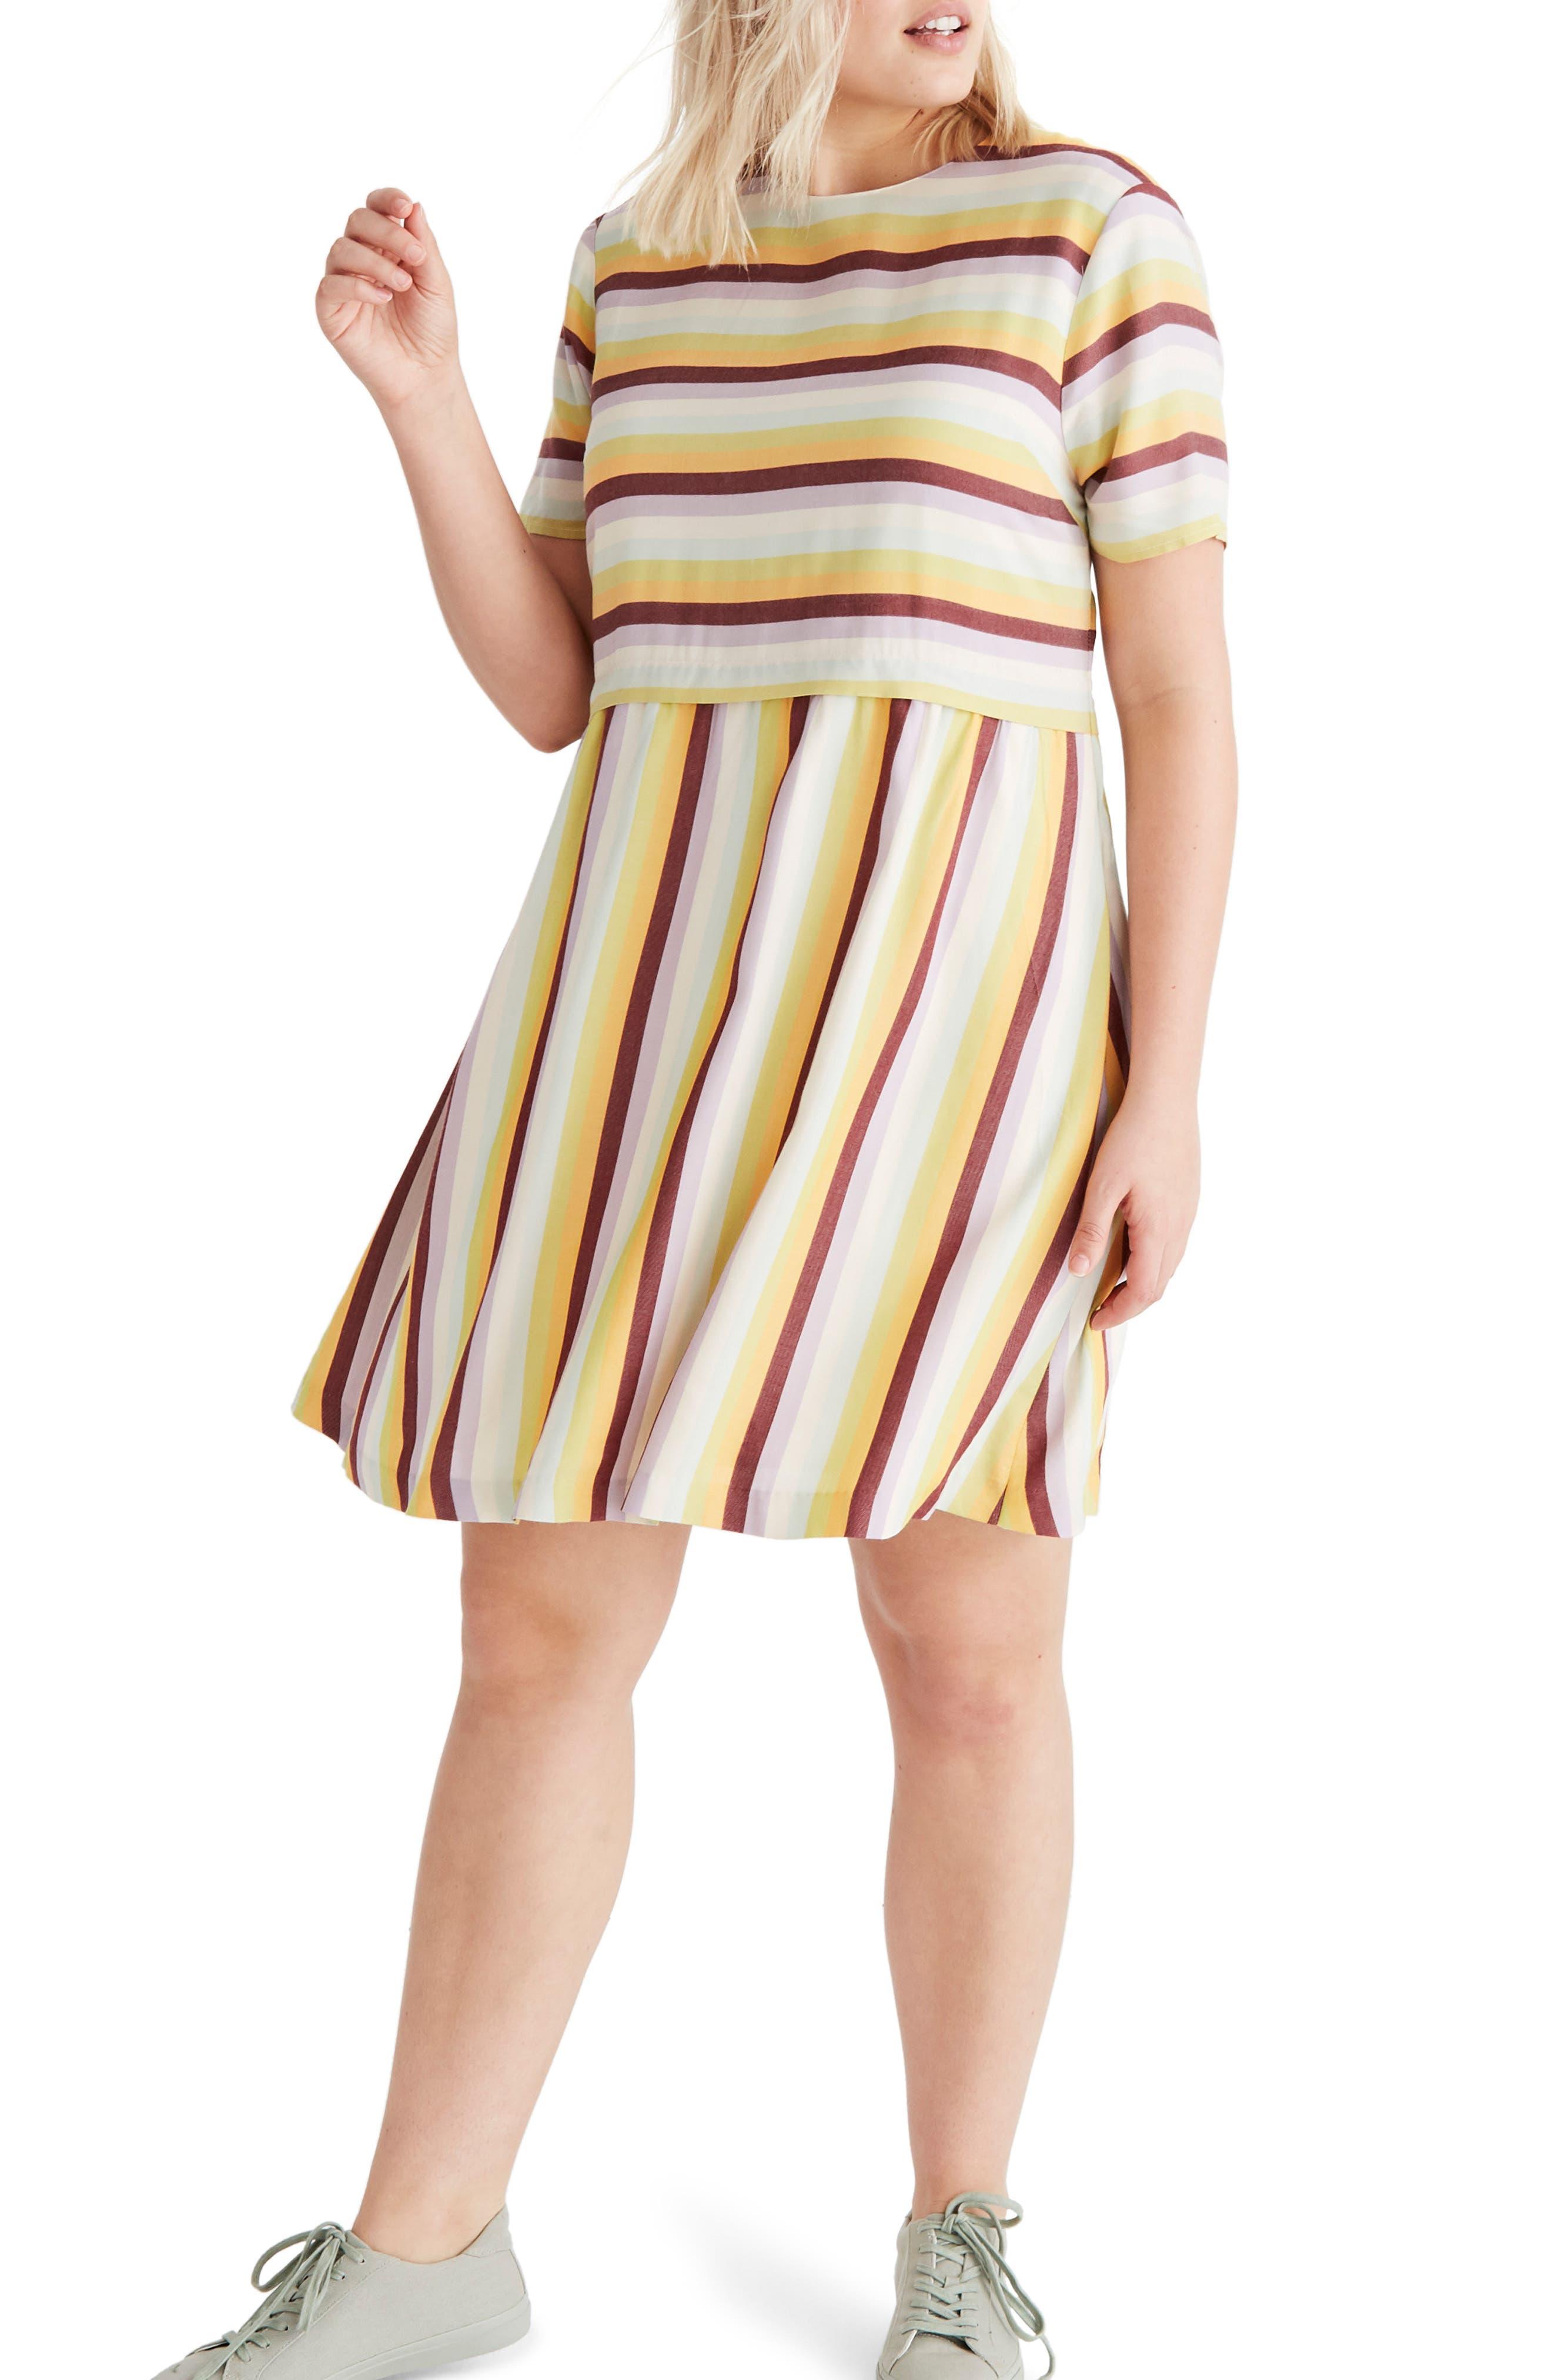 Madewell Stripe Scoop Back Dress, Yellow